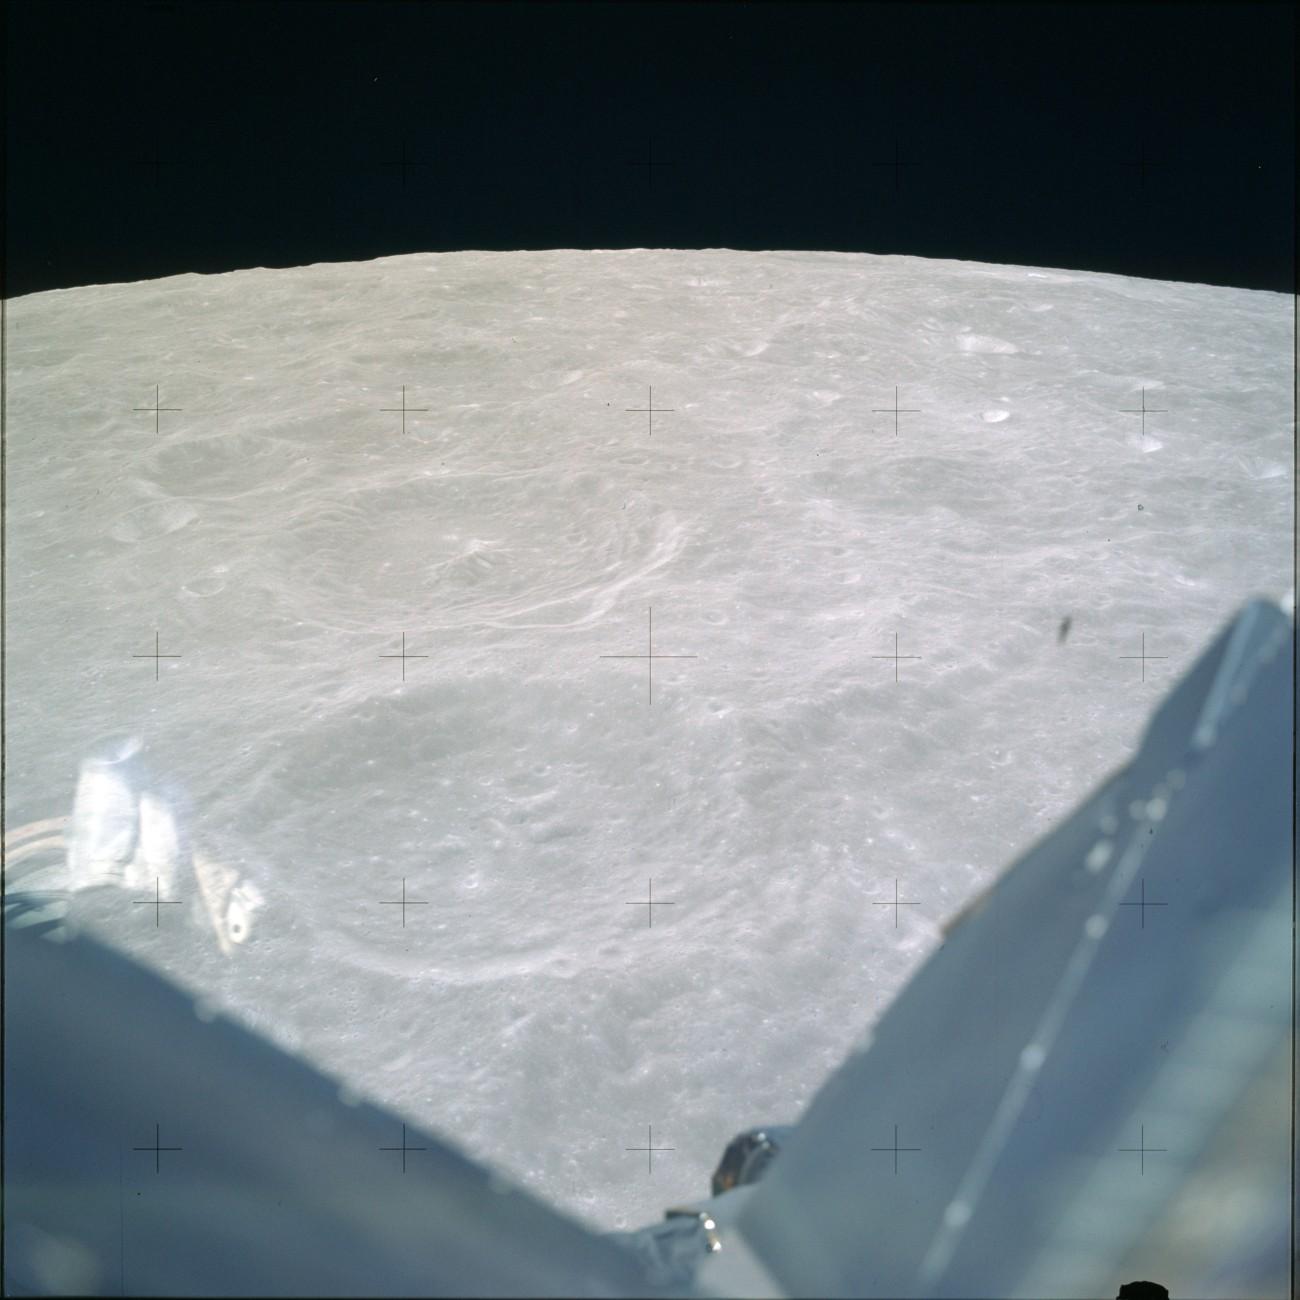 Approaching Landing Site